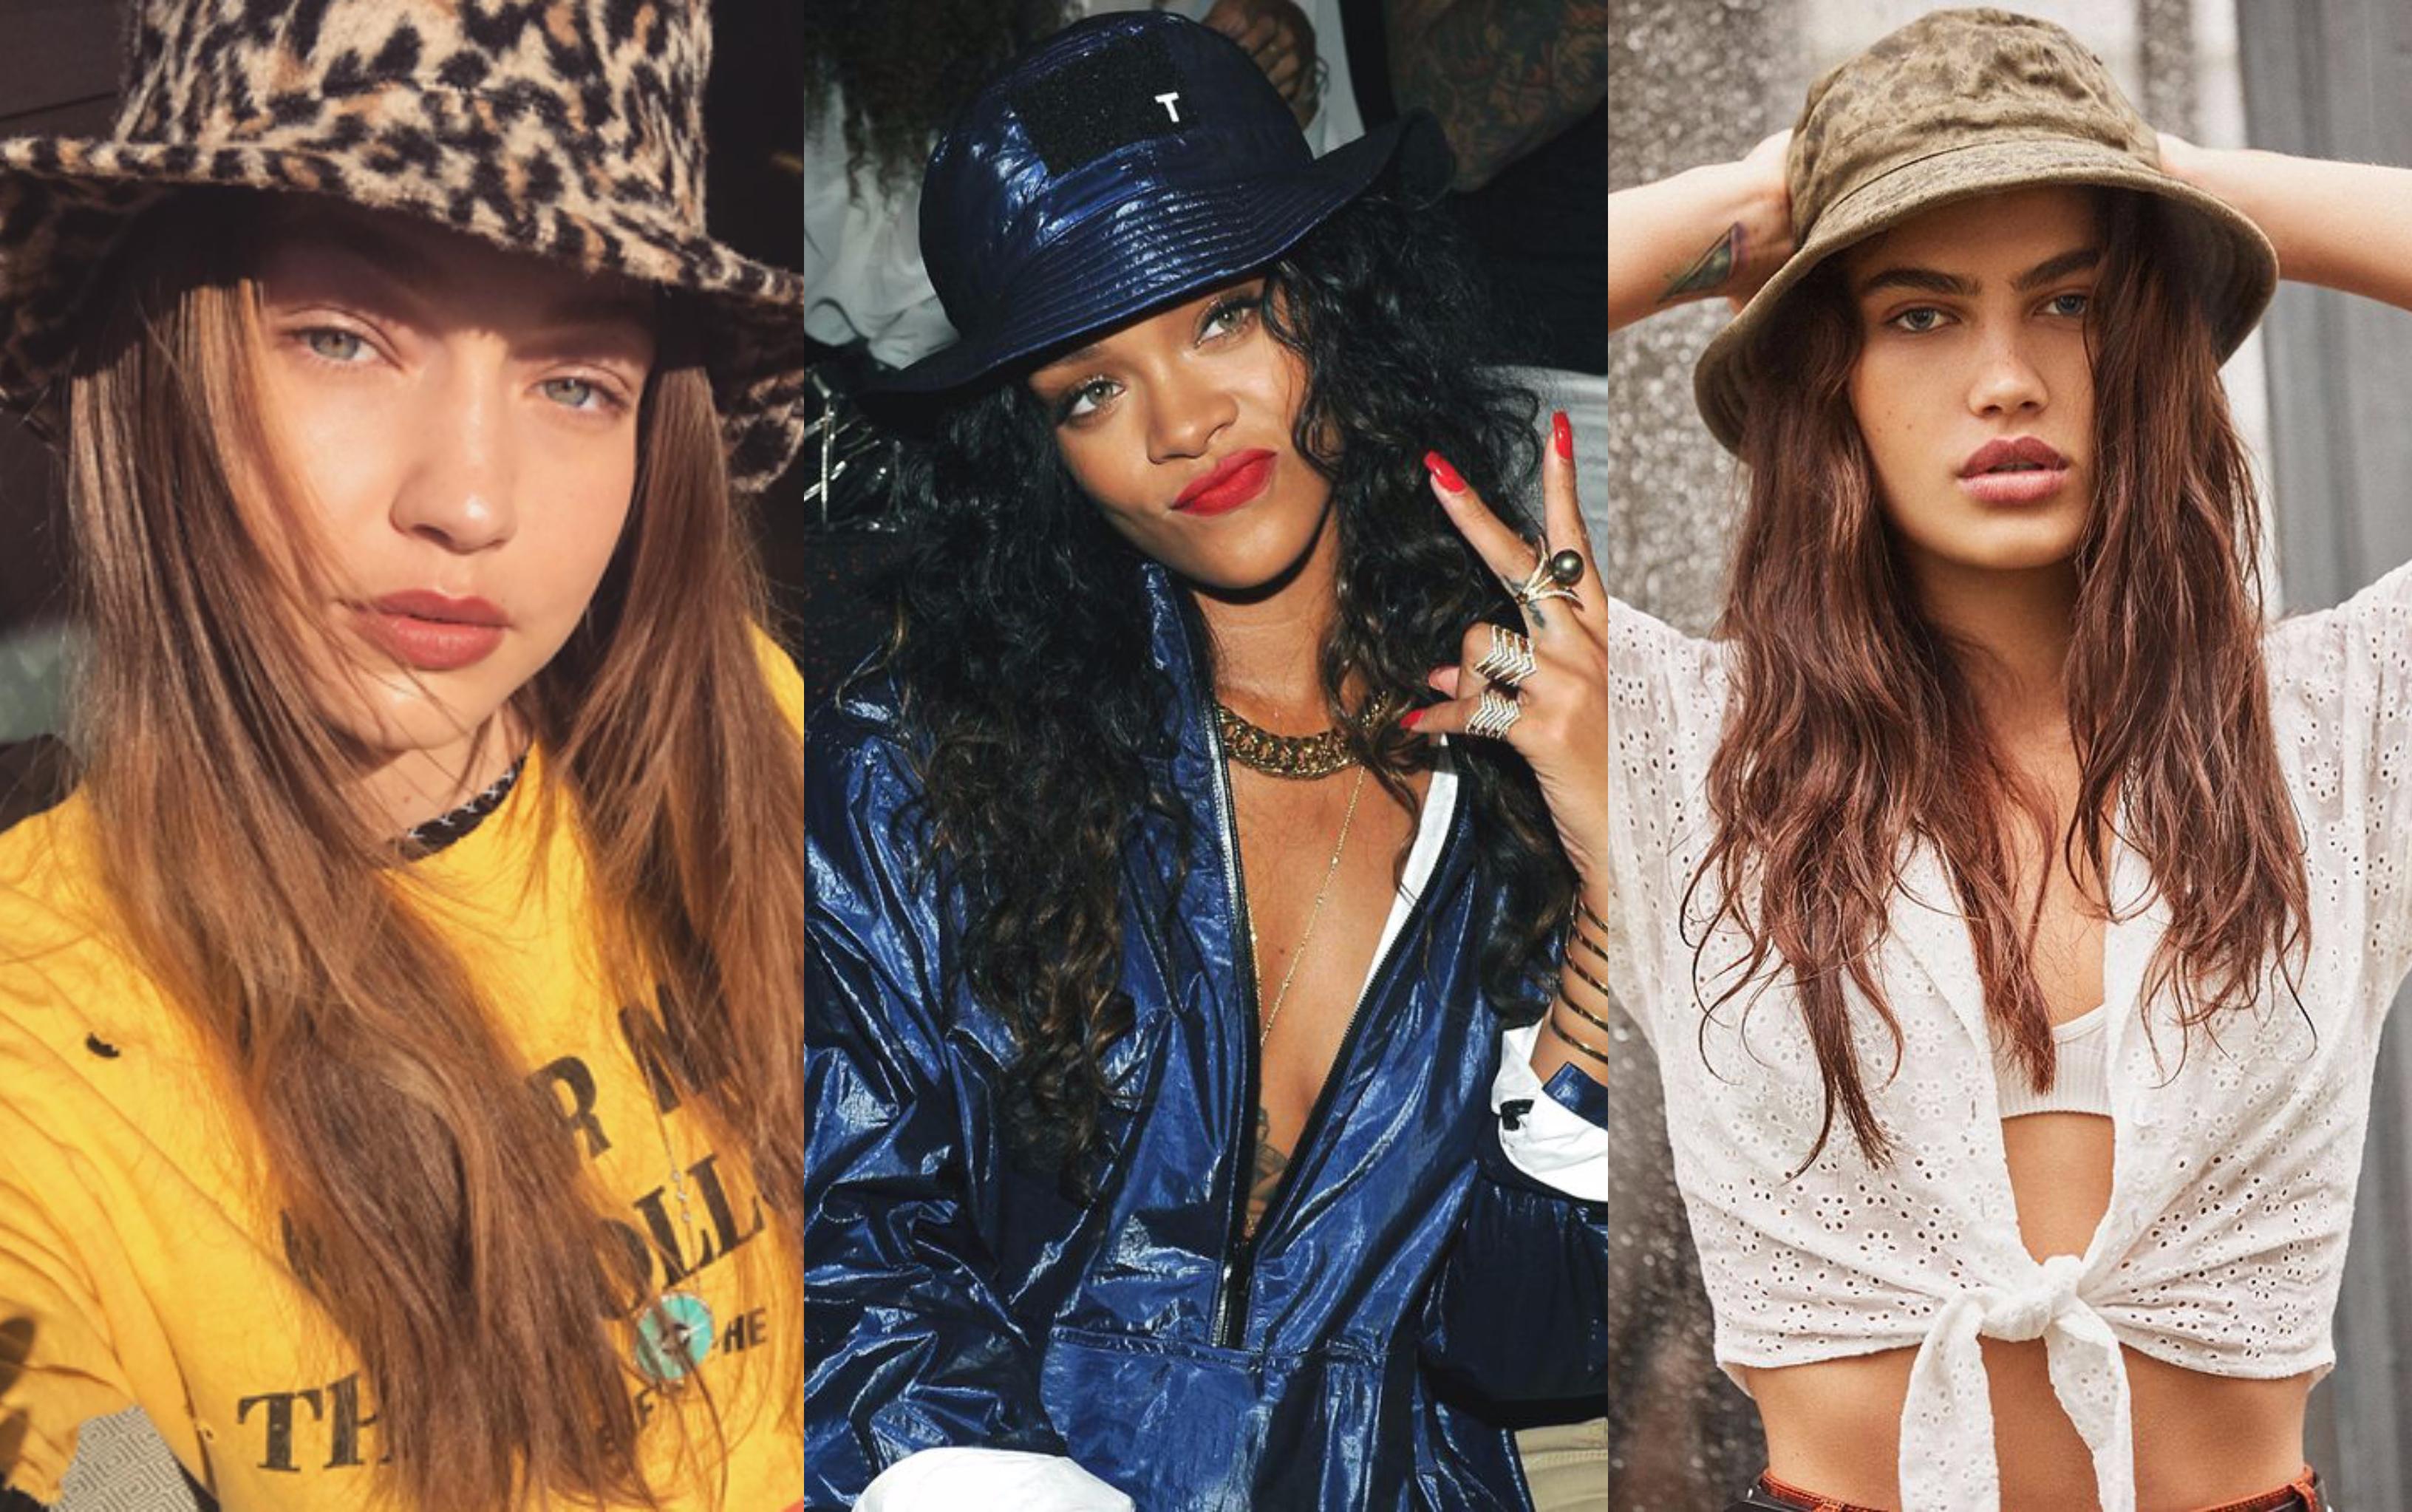 bucket-hat-kapelusz-w%C4%99dkarski-styl-